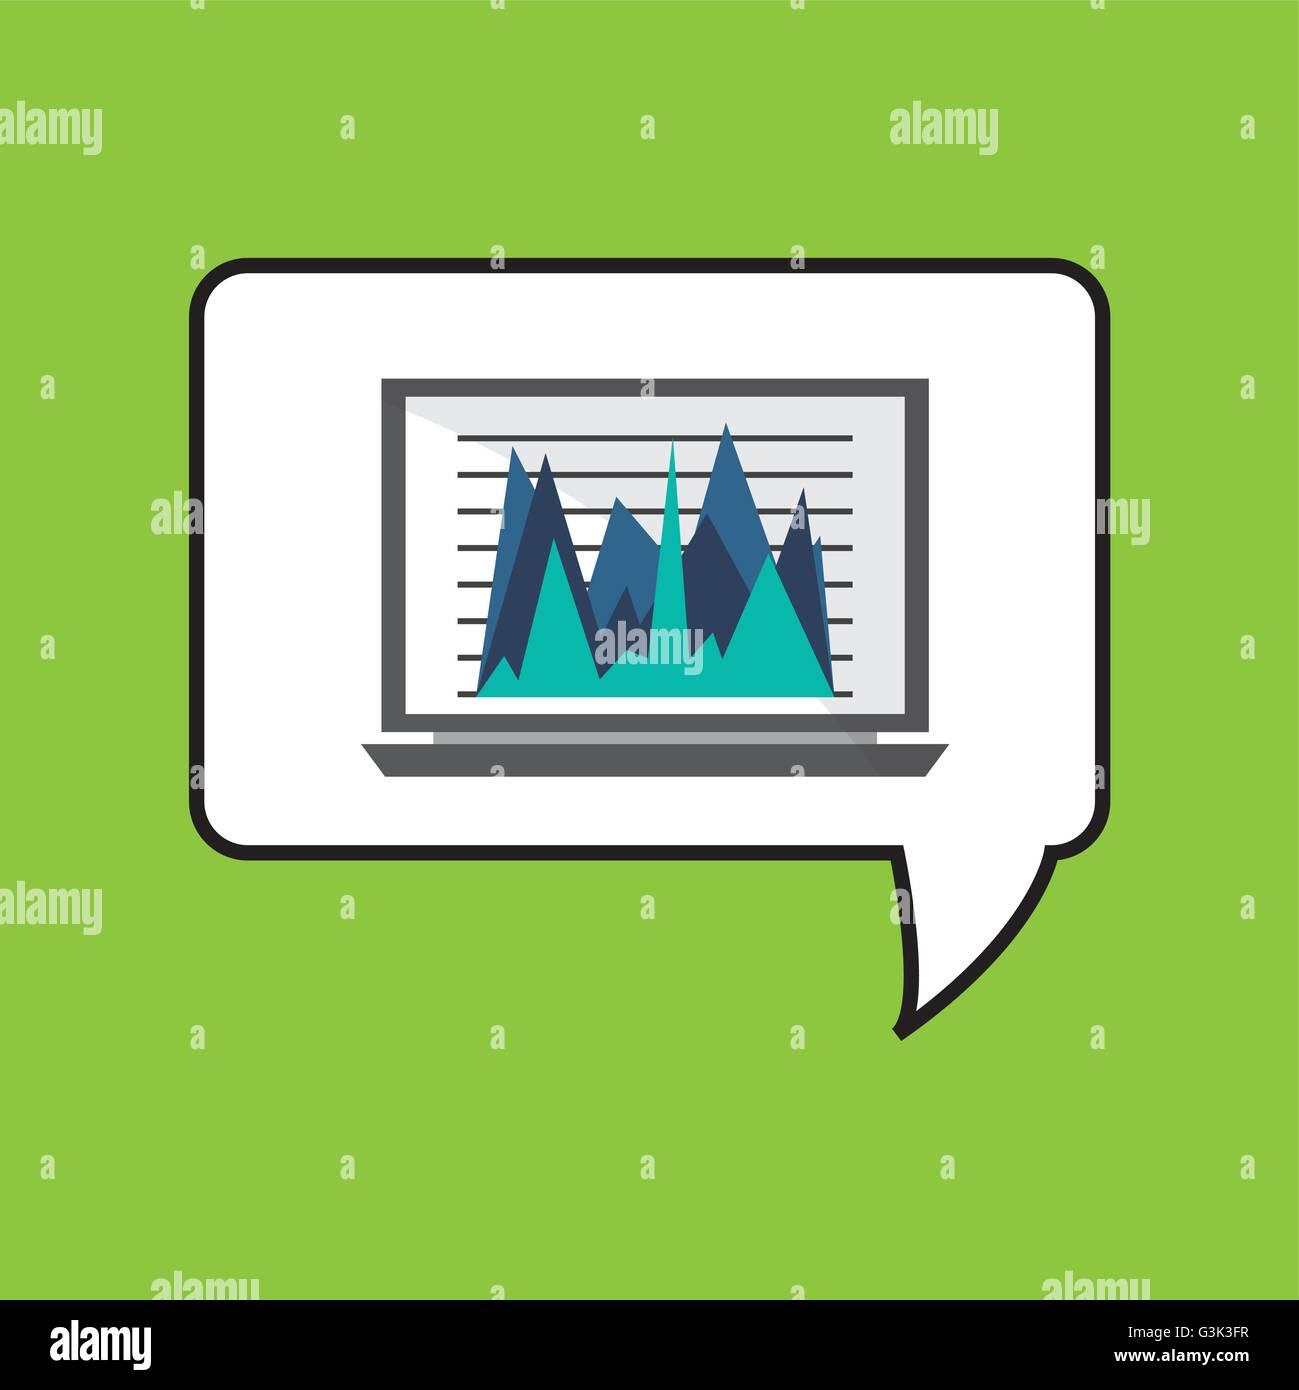 Business design.Communication icon. Colorfull illustration, vect - Stock Image